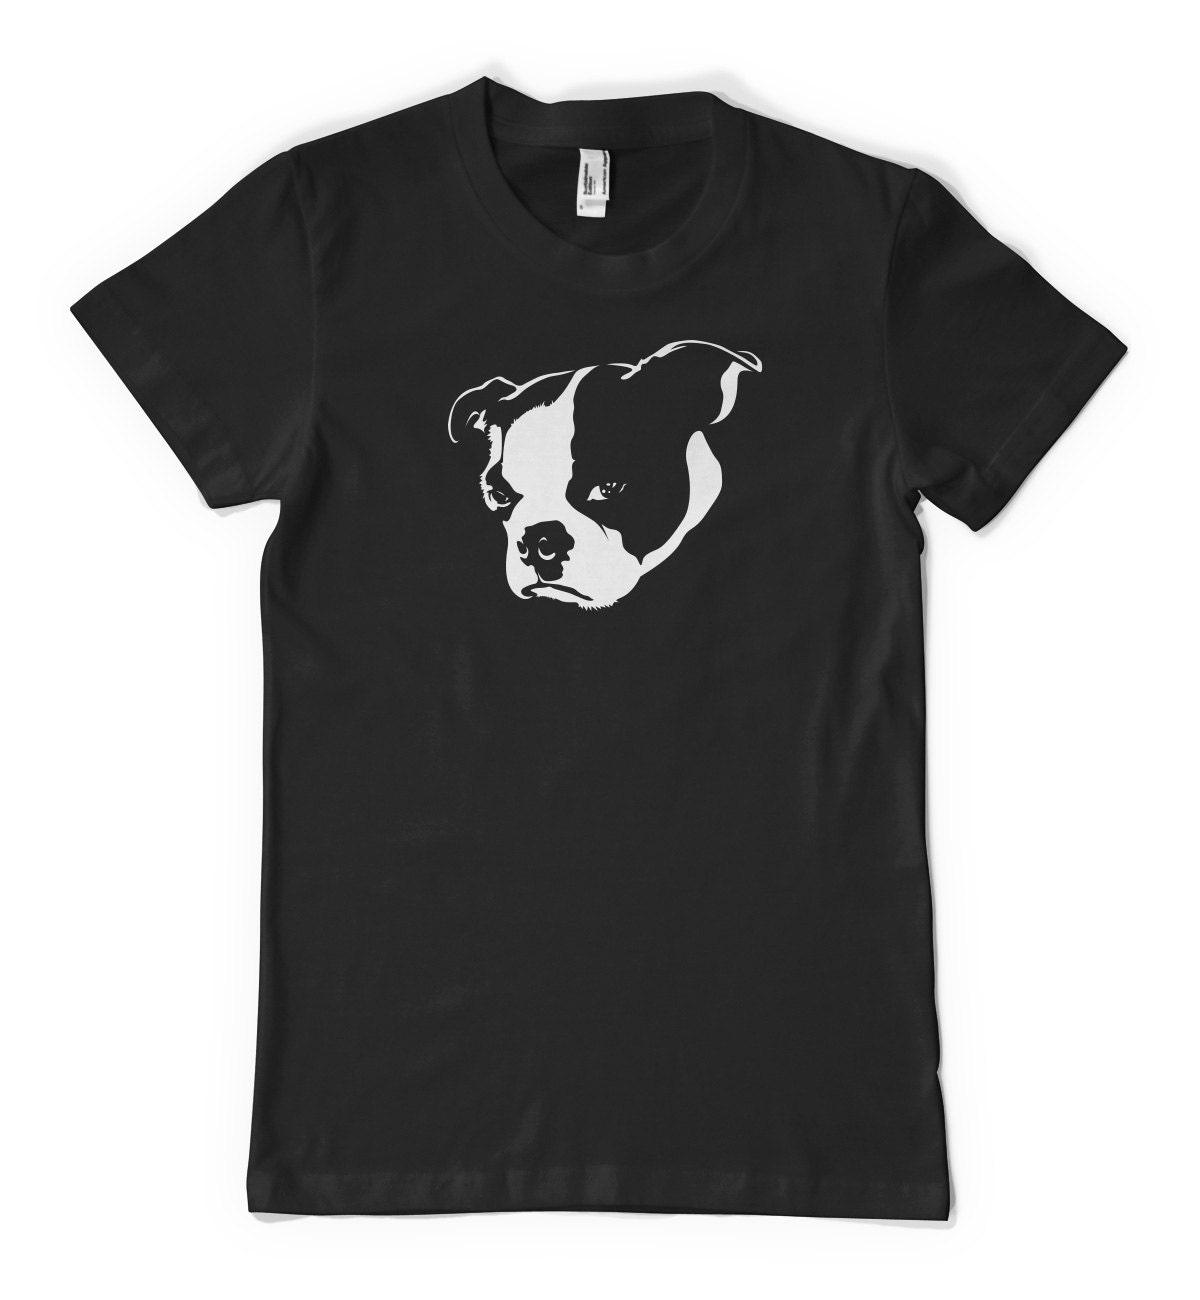 Grumpy boston terrier t shirt for Boston rescue 2 t shirt